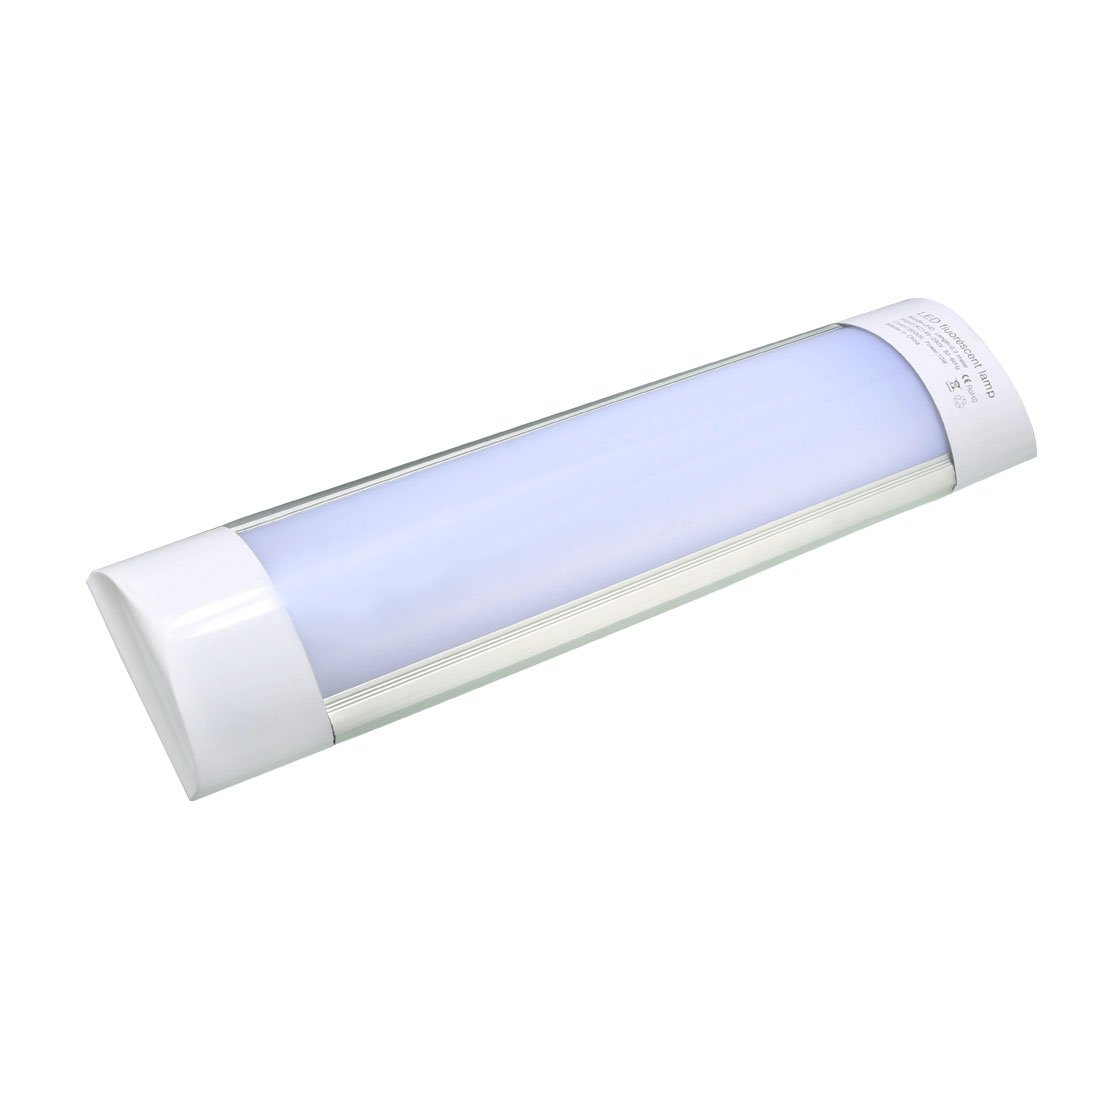 uxcell AC 85-265V 12W LED Batten Light Lamp Ceiling Purification Light Pure White